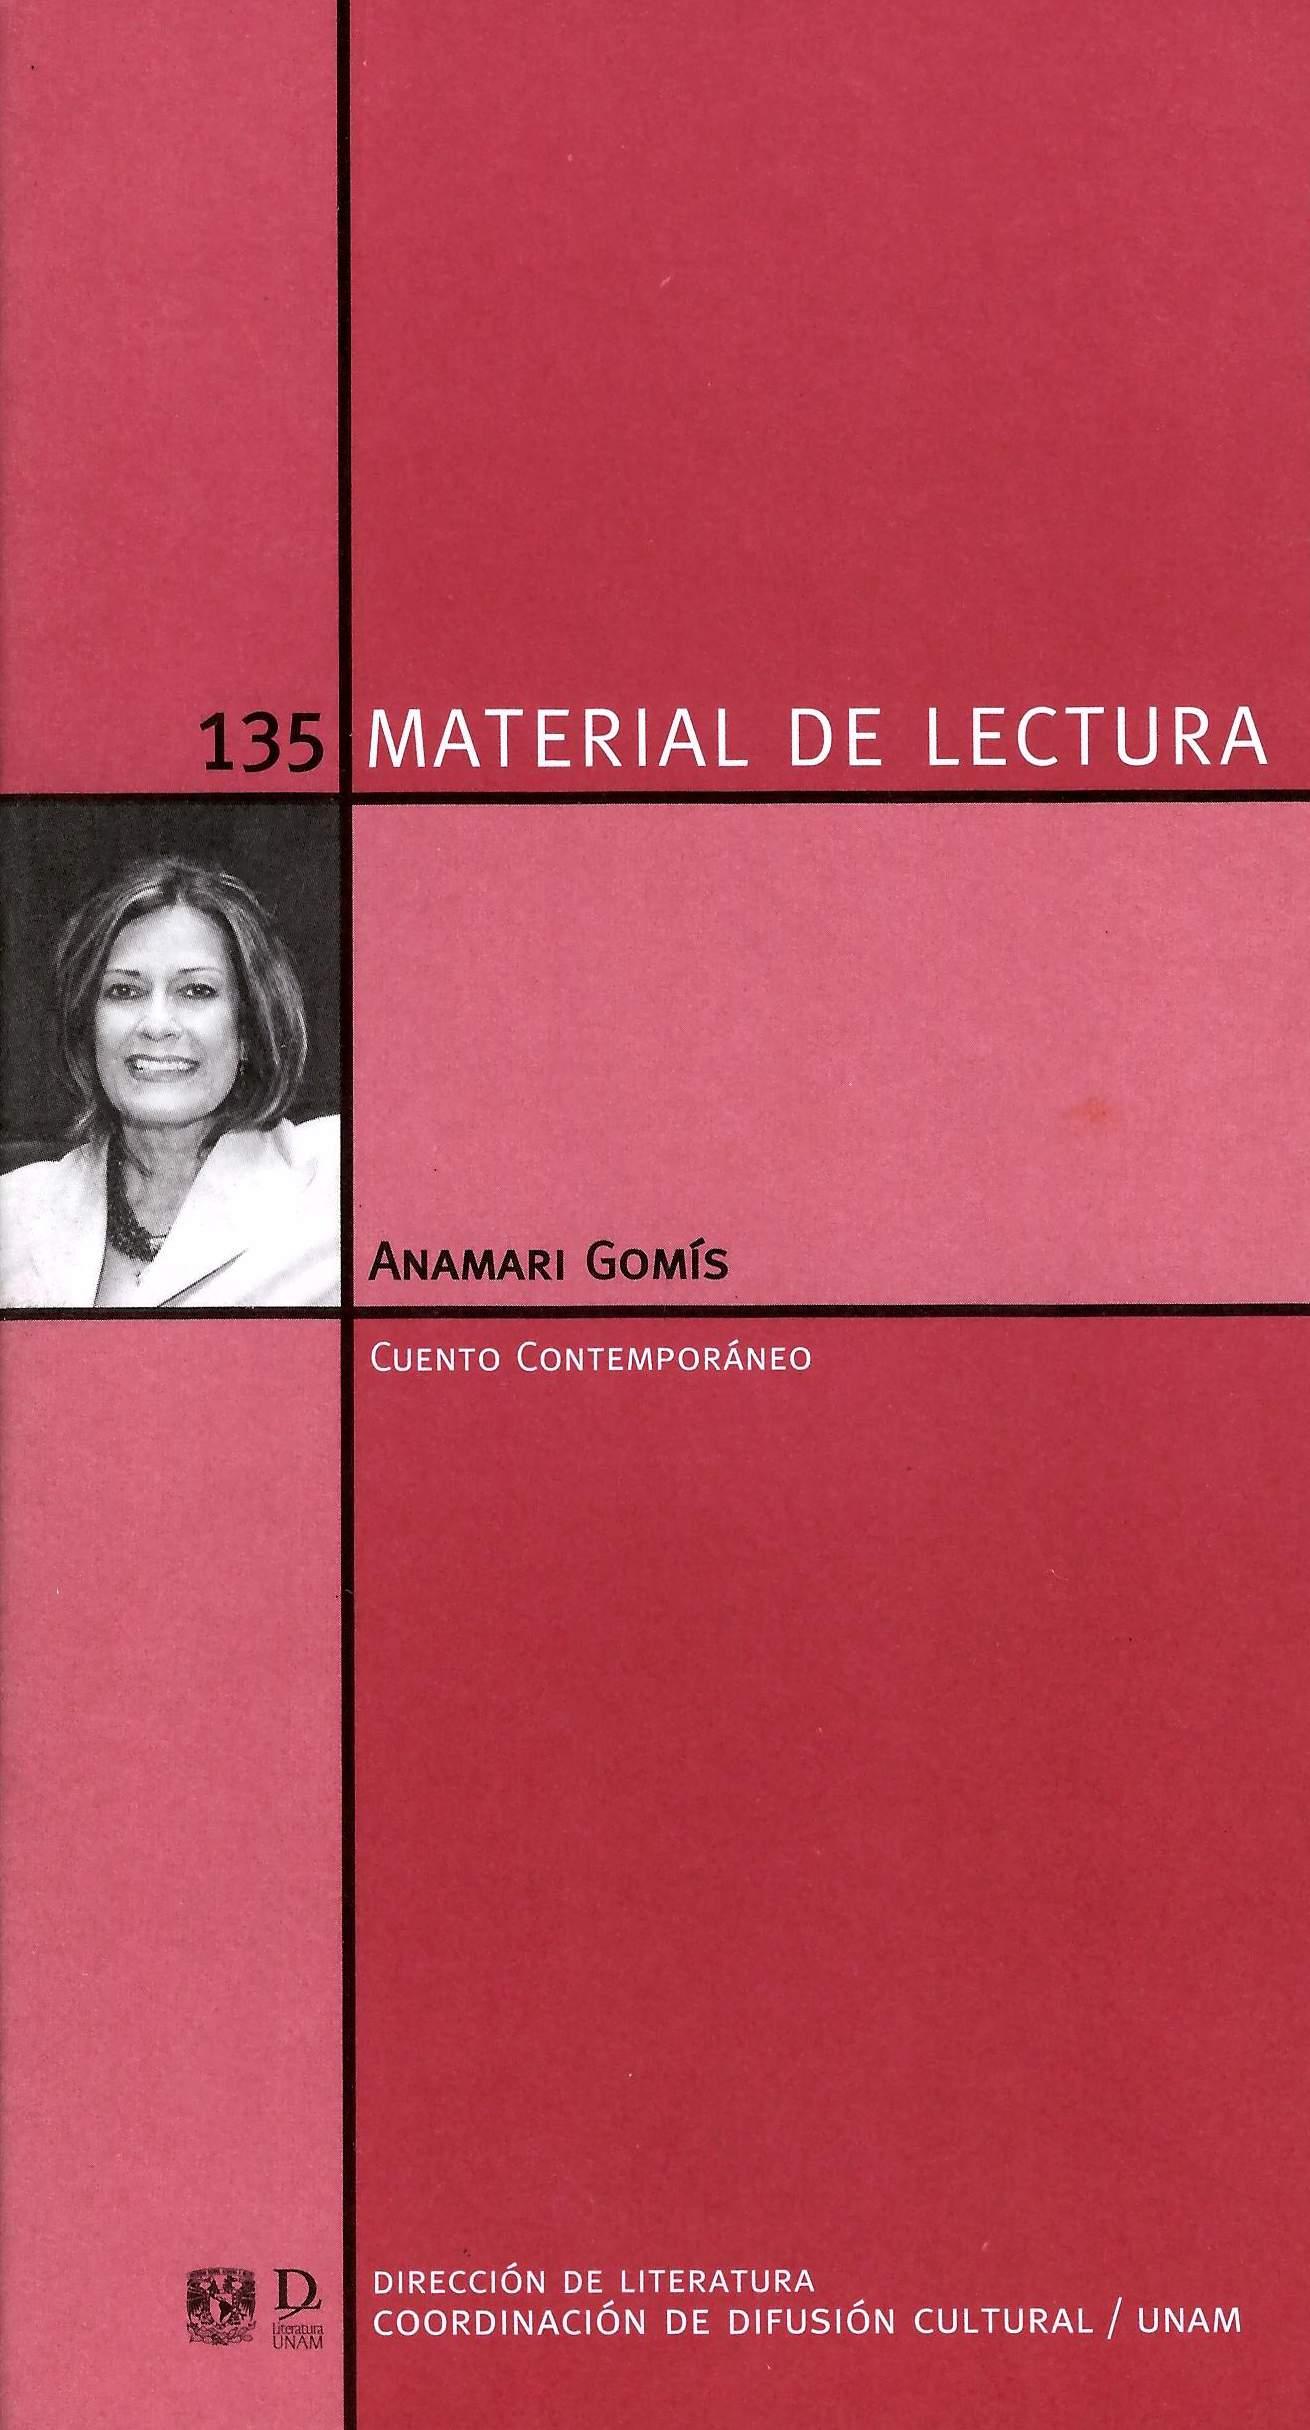 Anamari Gomís